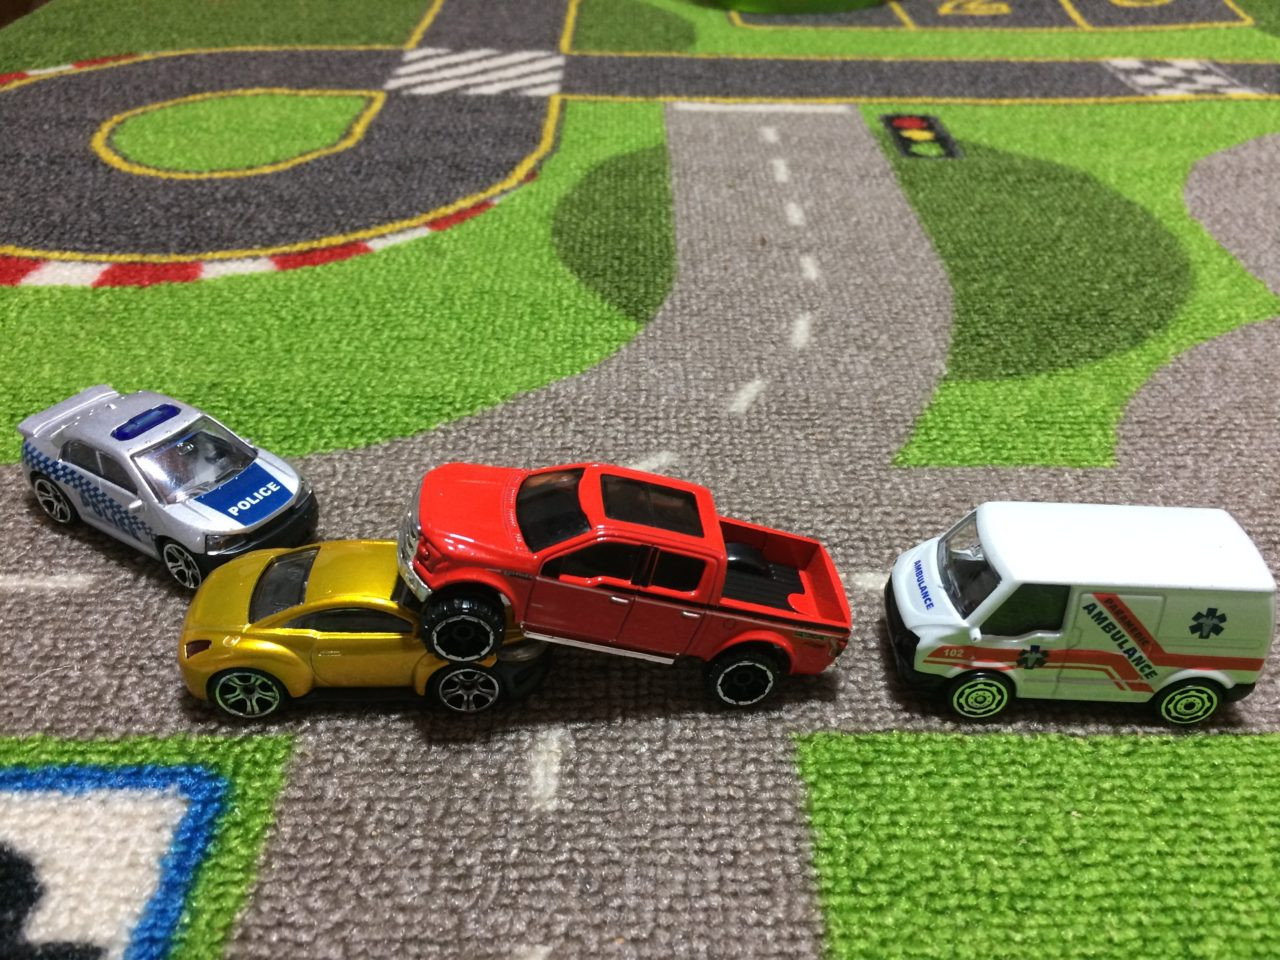 accidente de tránsito juguetes